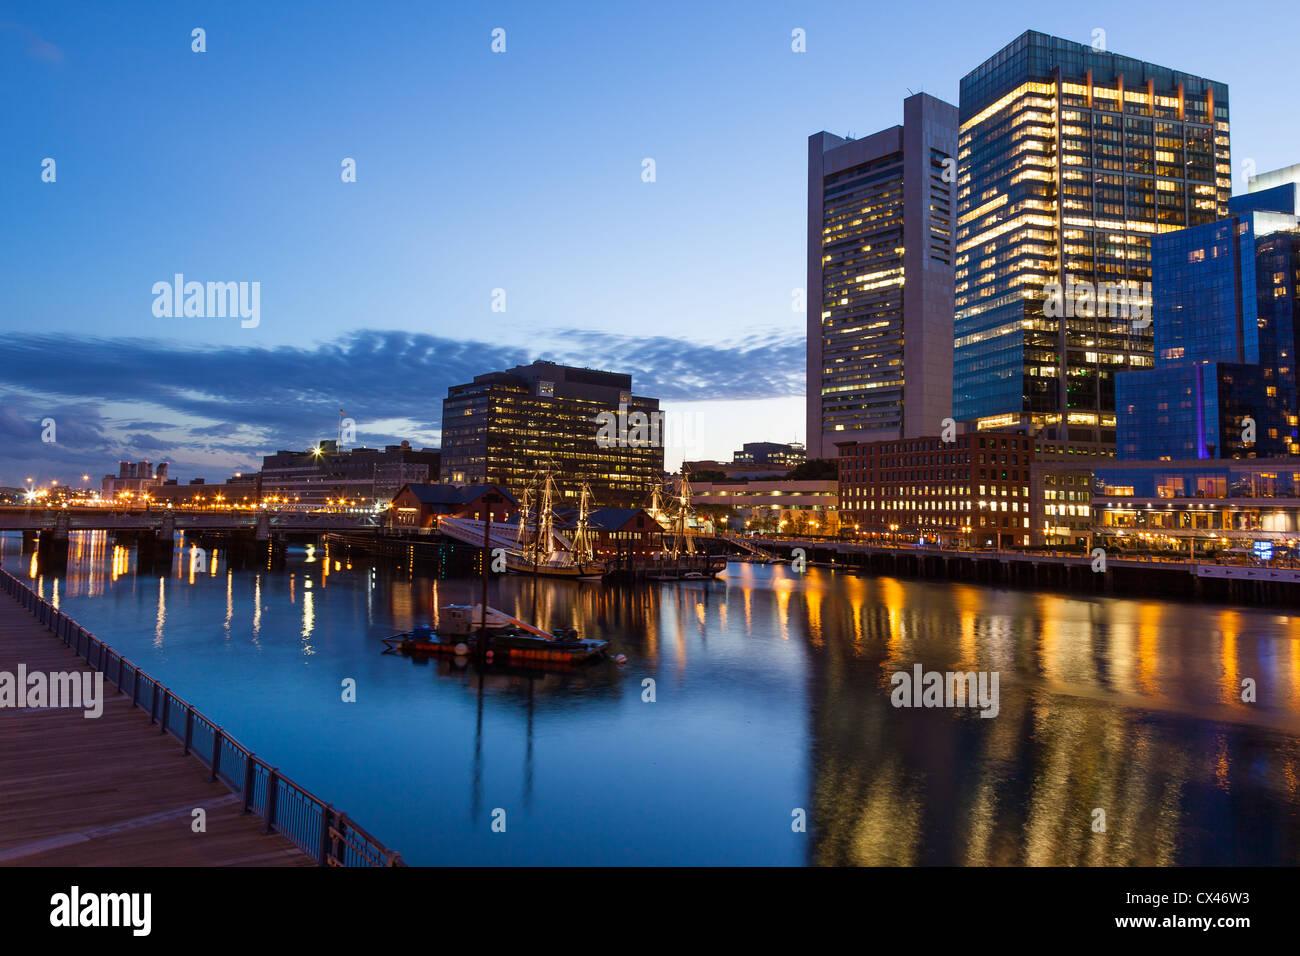 Boston Waterfront por noche, Massachusetts - ESTADOS UNIDOS Imagen De Stock